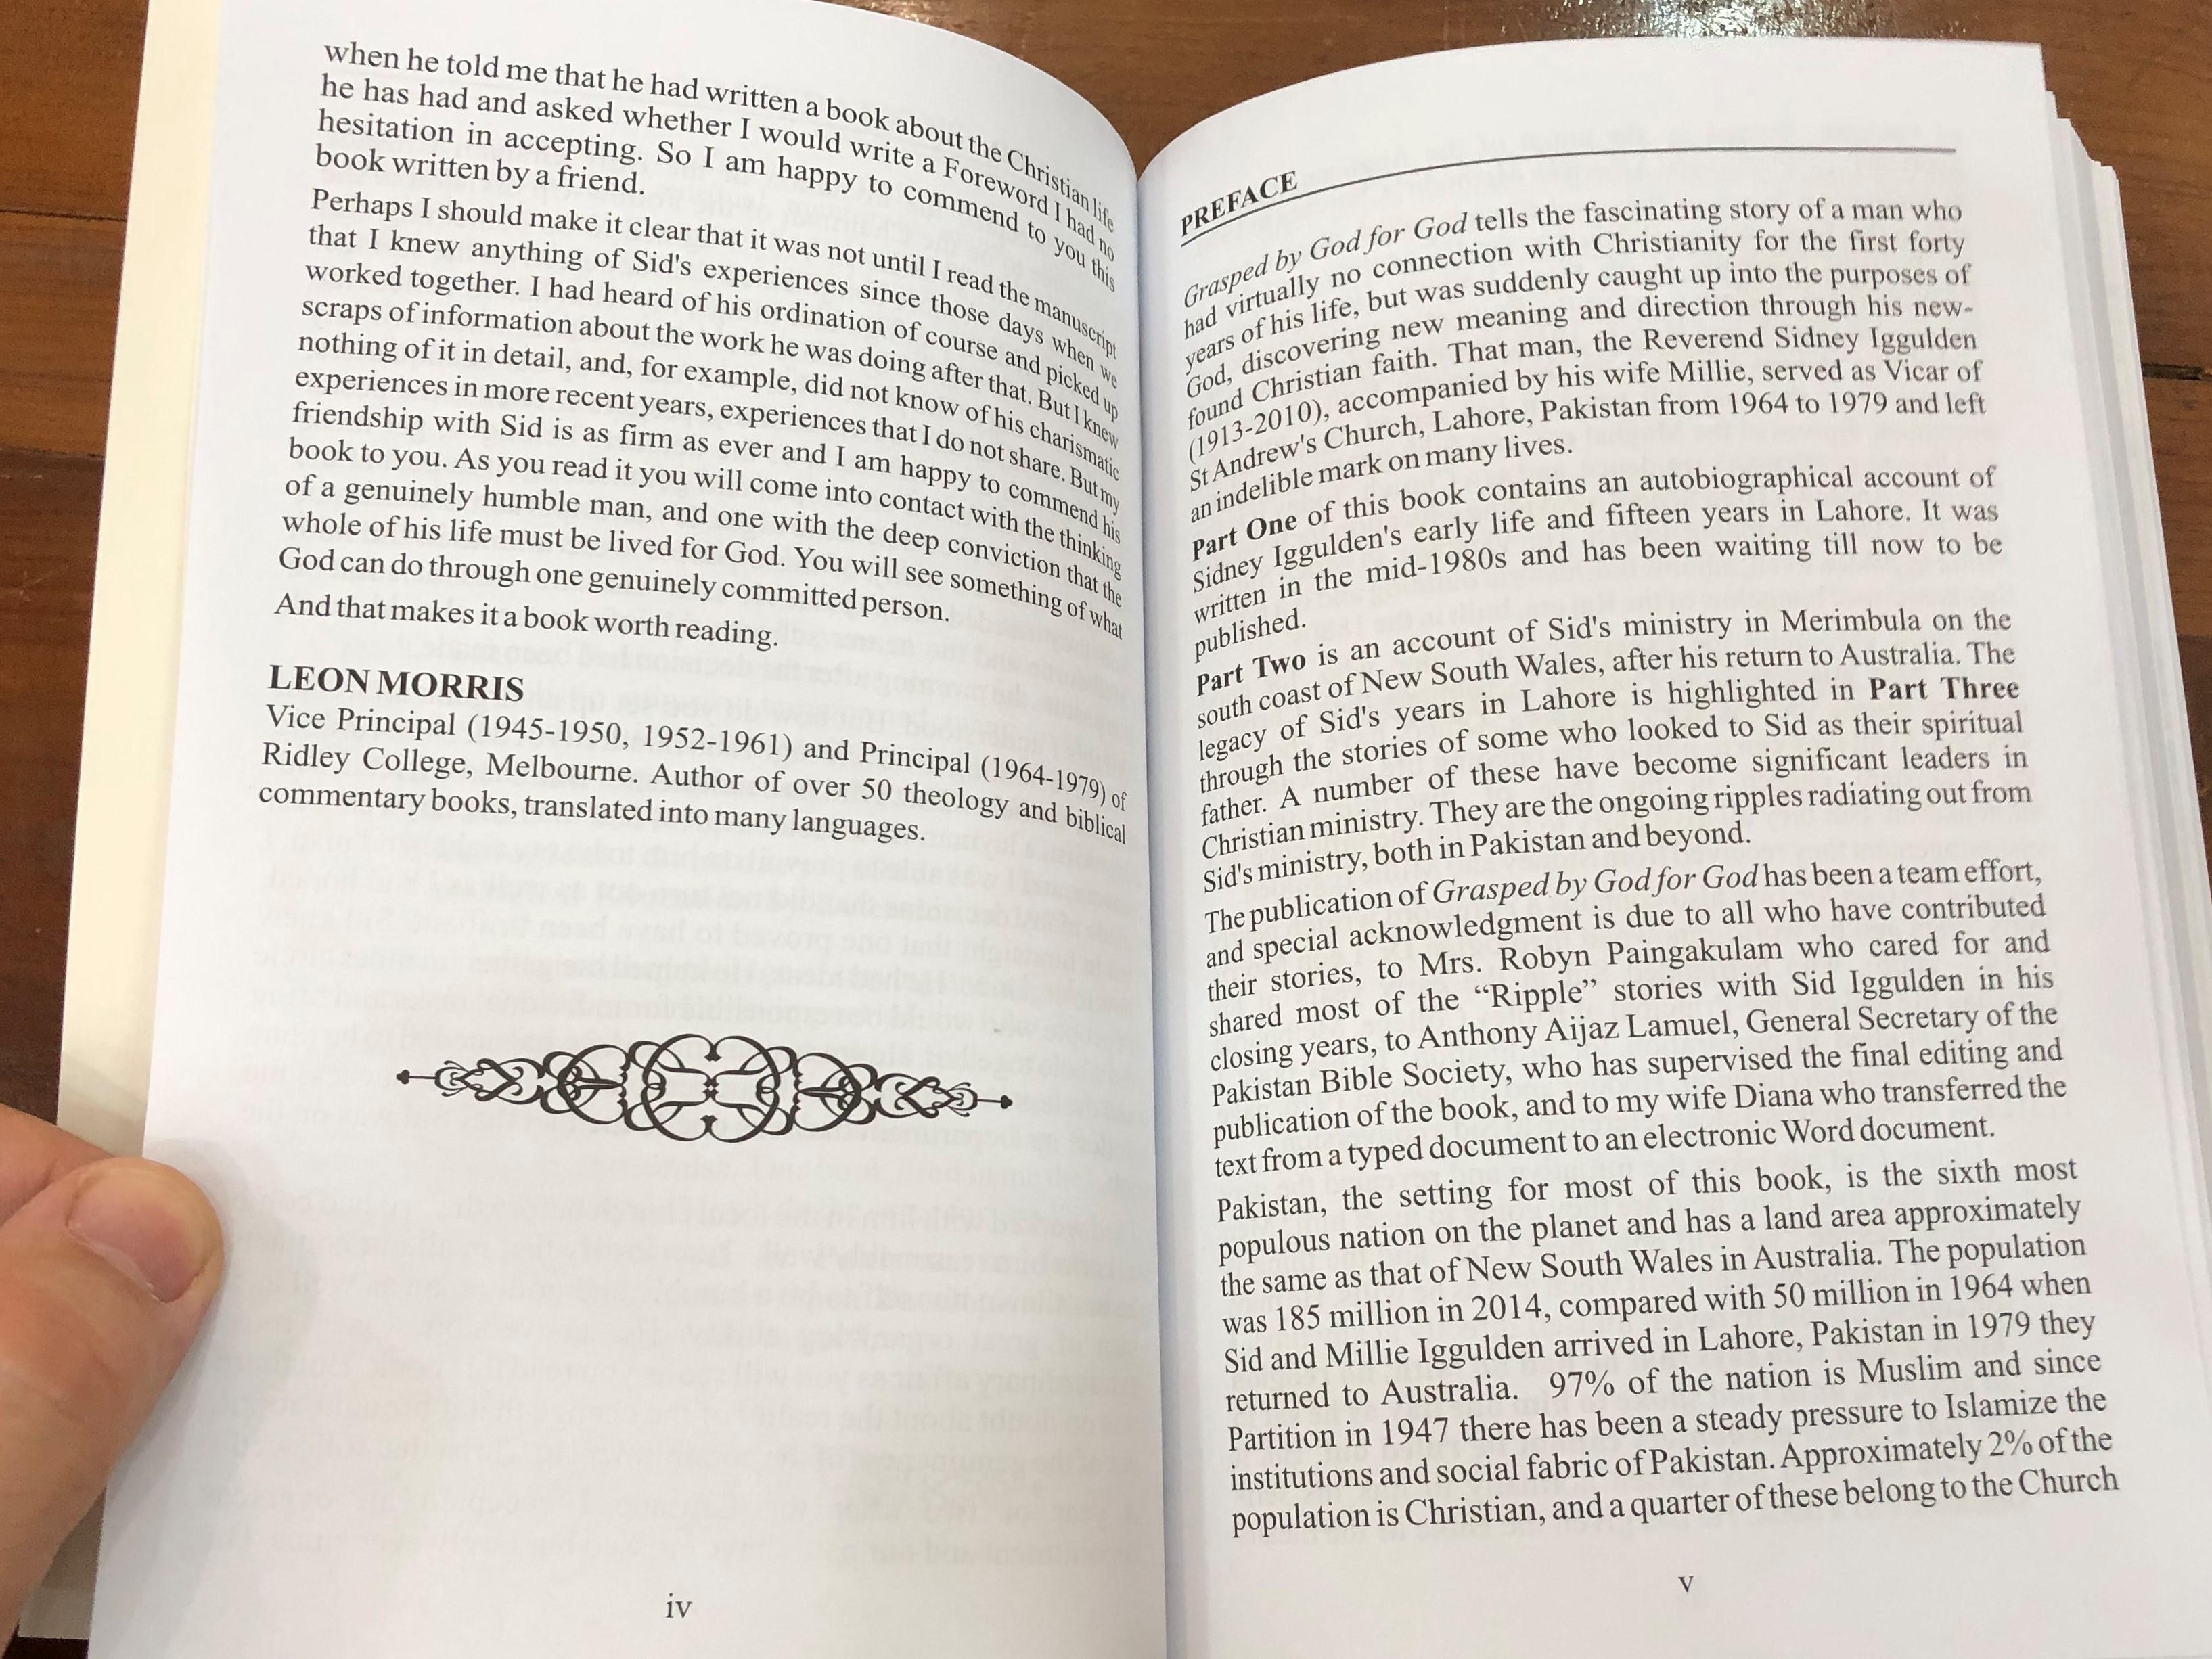 grasped-by-god-for-god-memoirs-of-rev.-sidney-h.-iggulden-pakistan-bible-society-2015-10-.jpg